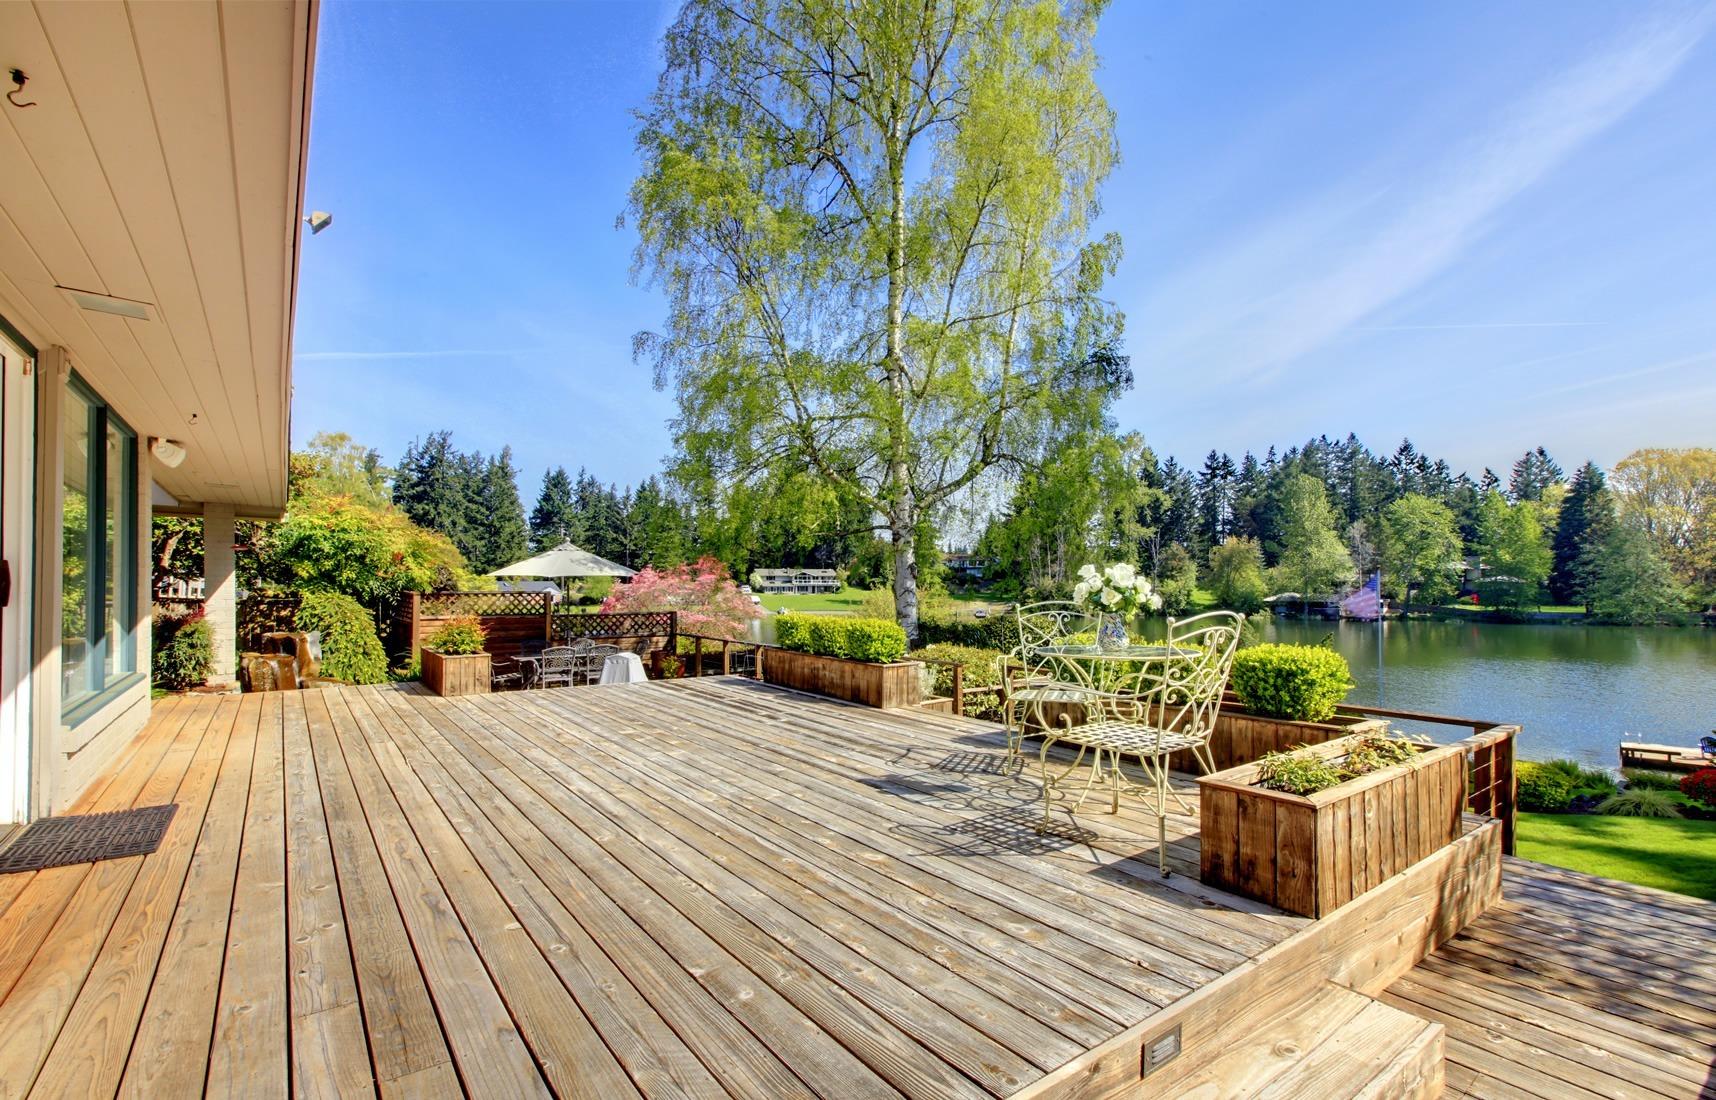 terrasse en bois li ge et namur de la r alisation la pose. Black Bedroom Furniture Sets. Home Design Ideas